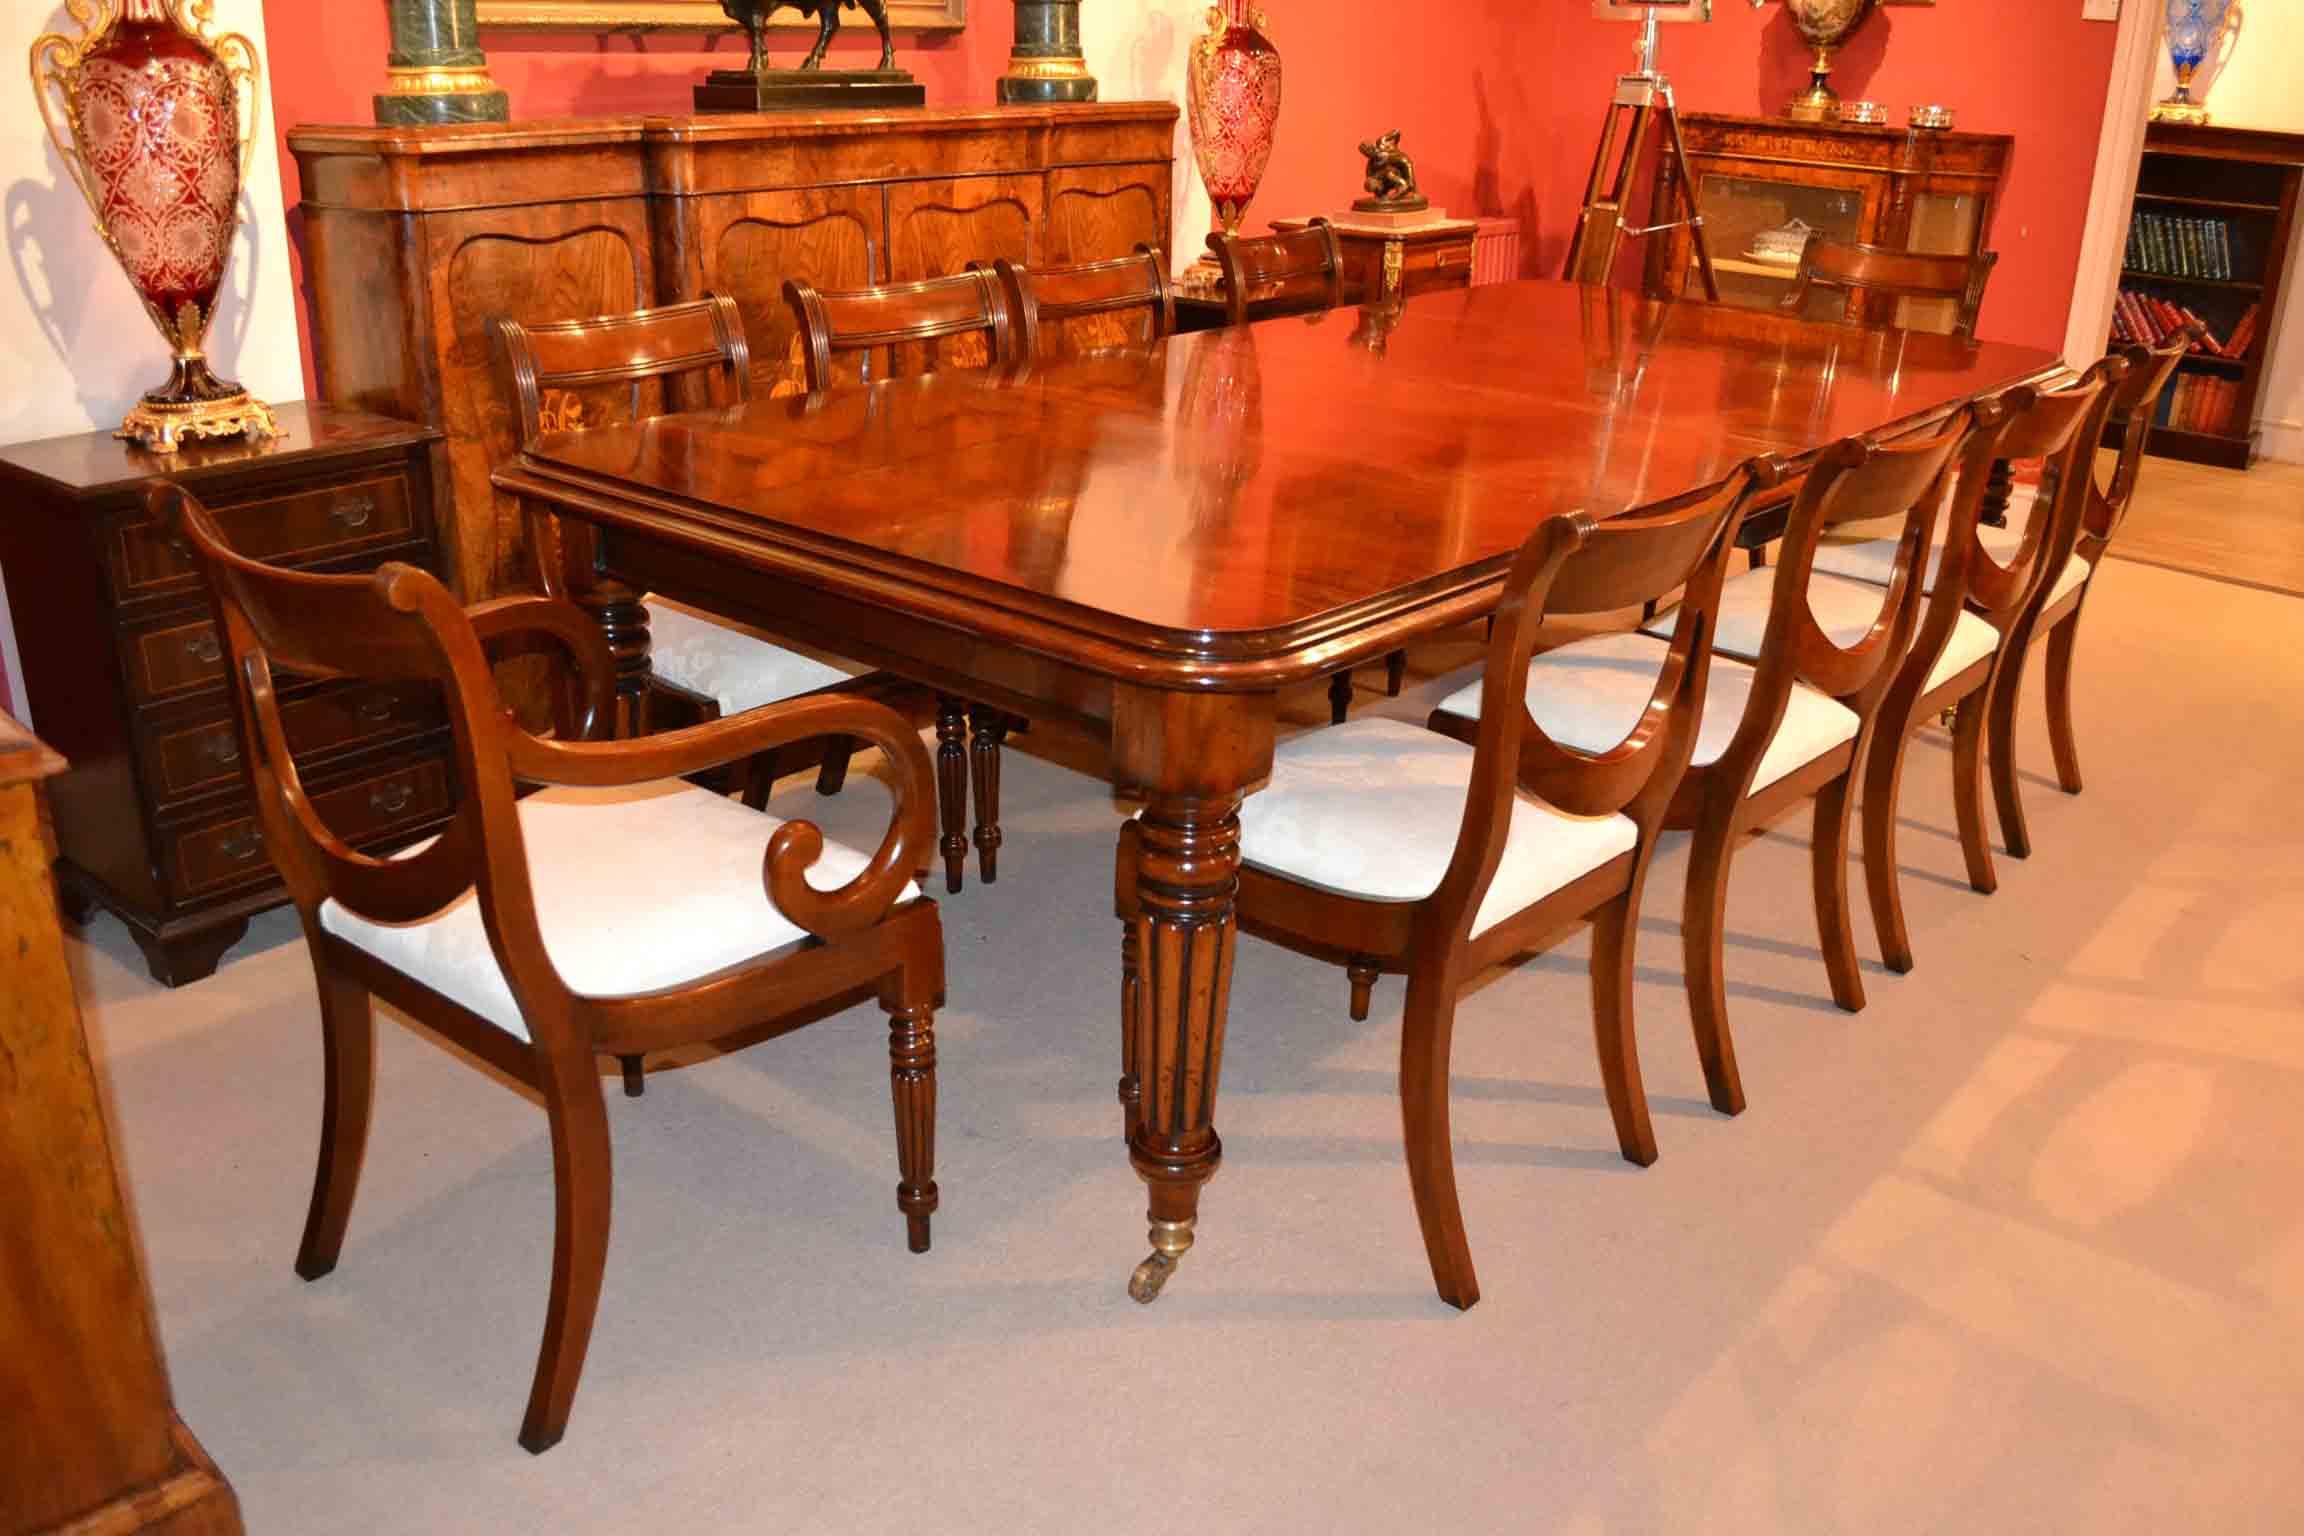 English Regency Dining Table 10 Regency Drape Chairs